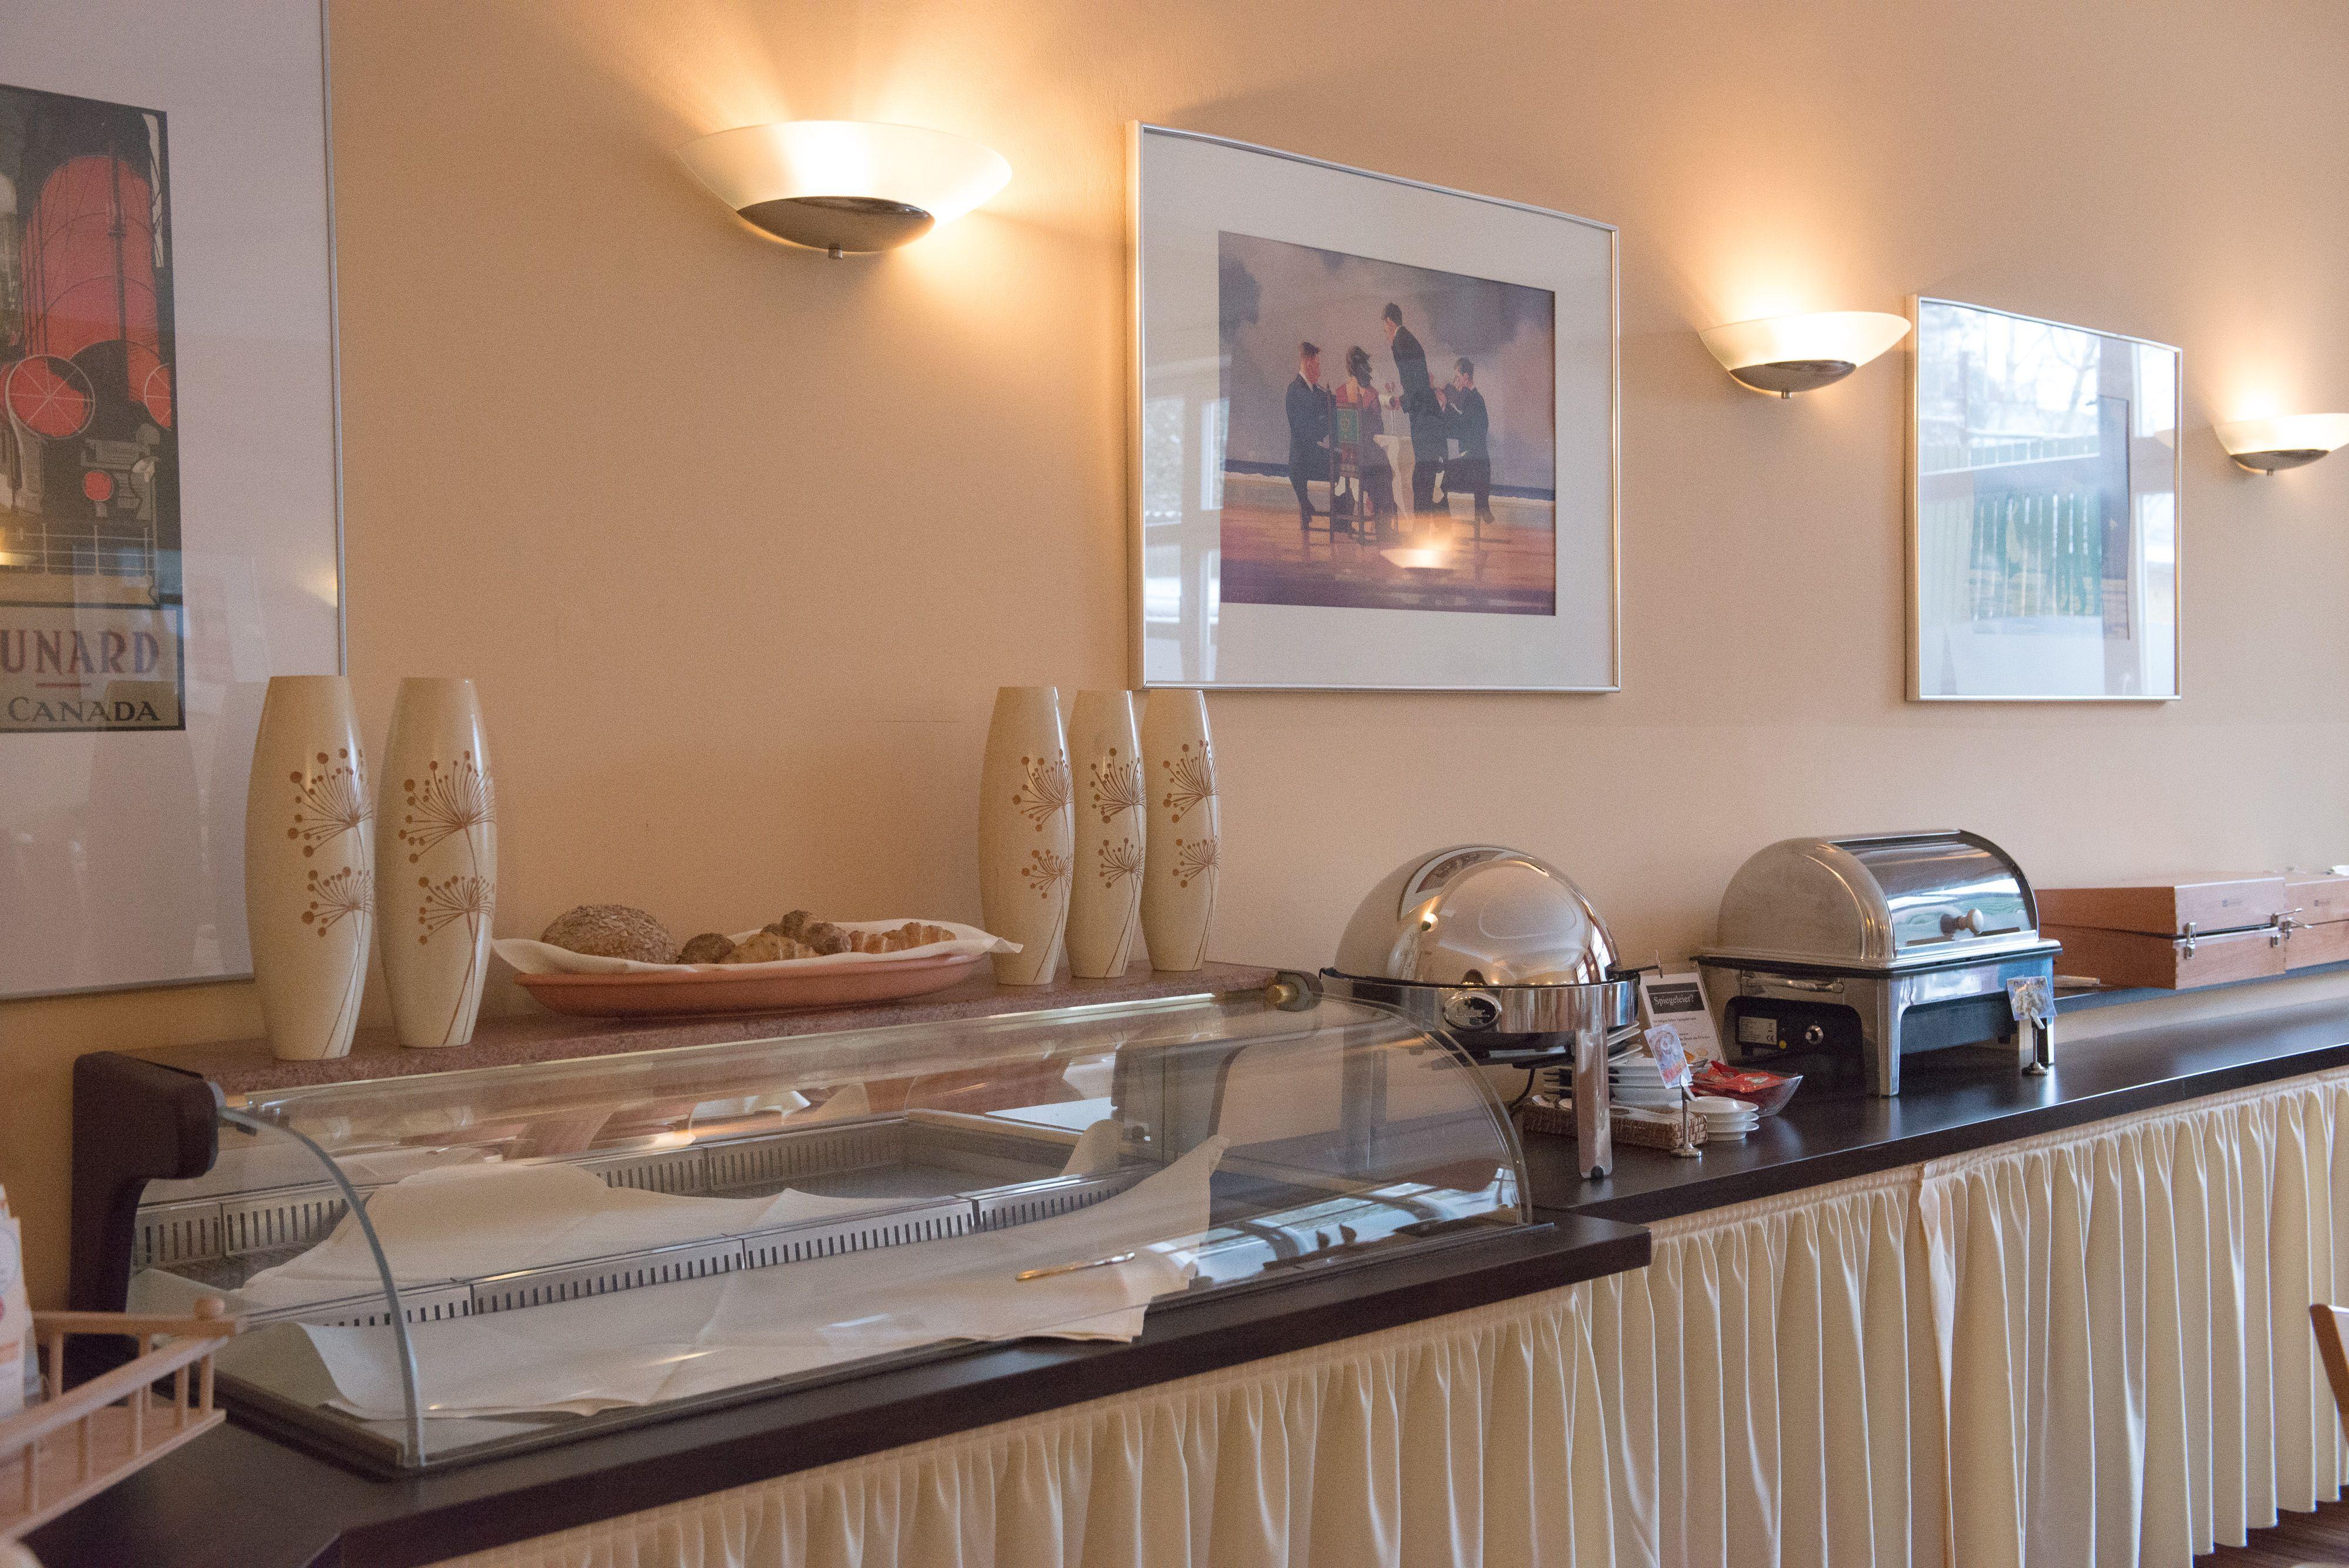 Breakfast buffet, Hotel Stadt Cuxhaven #hotel #Restaurant #Cuxhaven #breakfast